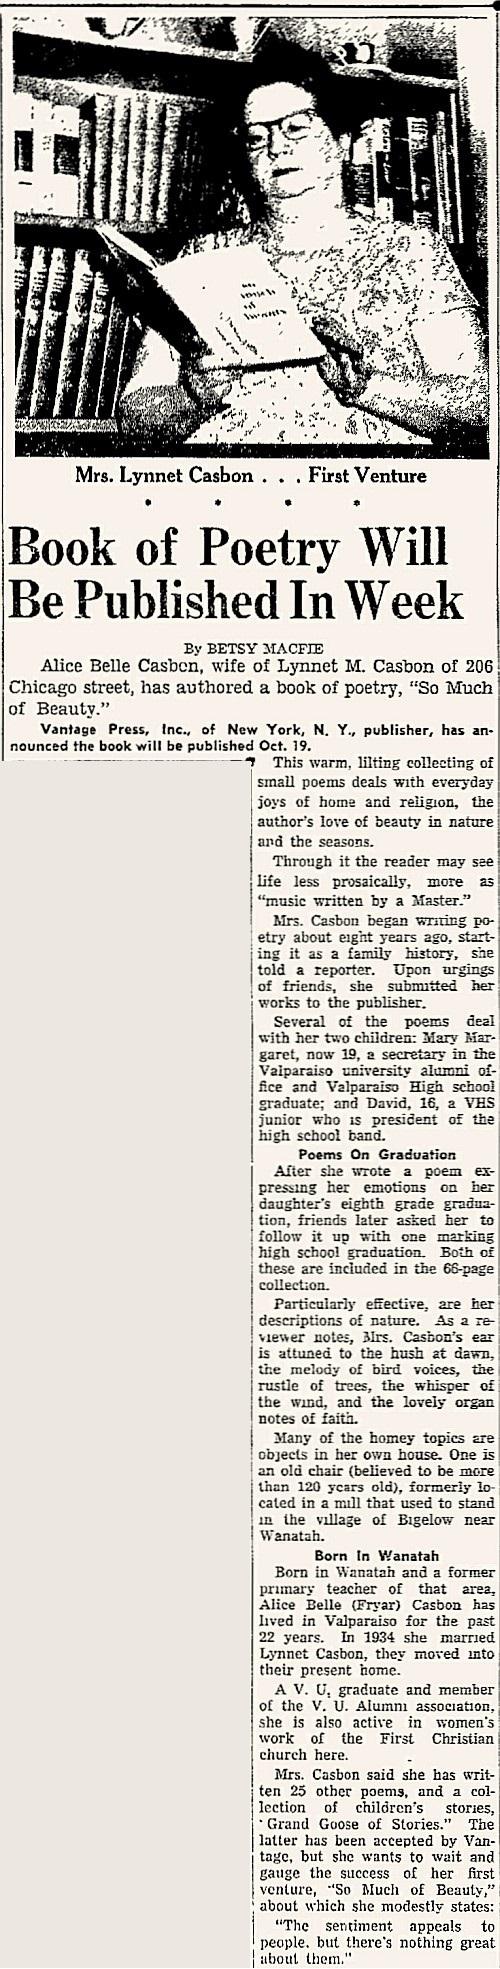 Casbon Belle Fryar Vidette 12 Oct 1956b